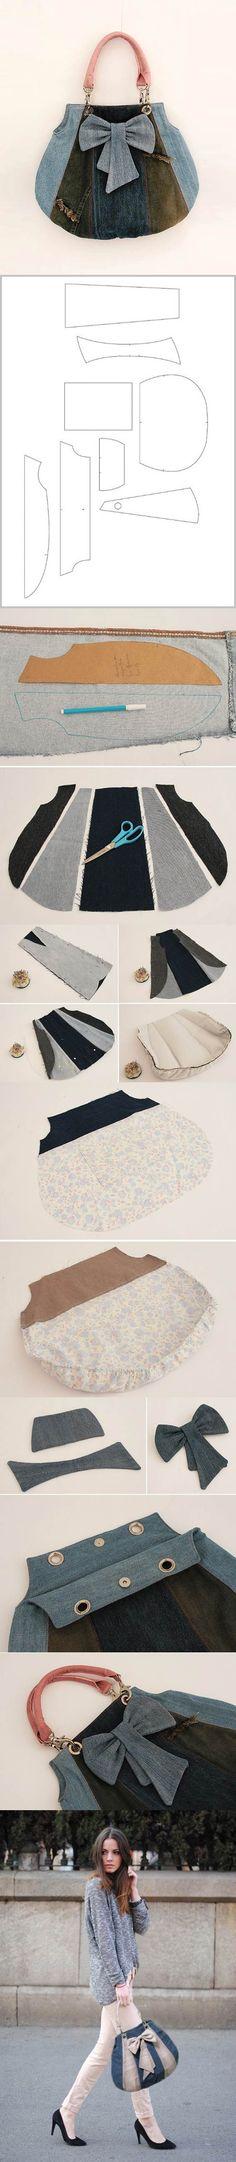 DIY Fashionable Handbag from Old Jeans | iCreativeIdeas.com LIKE Us on Facebook ==> https://www.facebook.com/icreativeideas